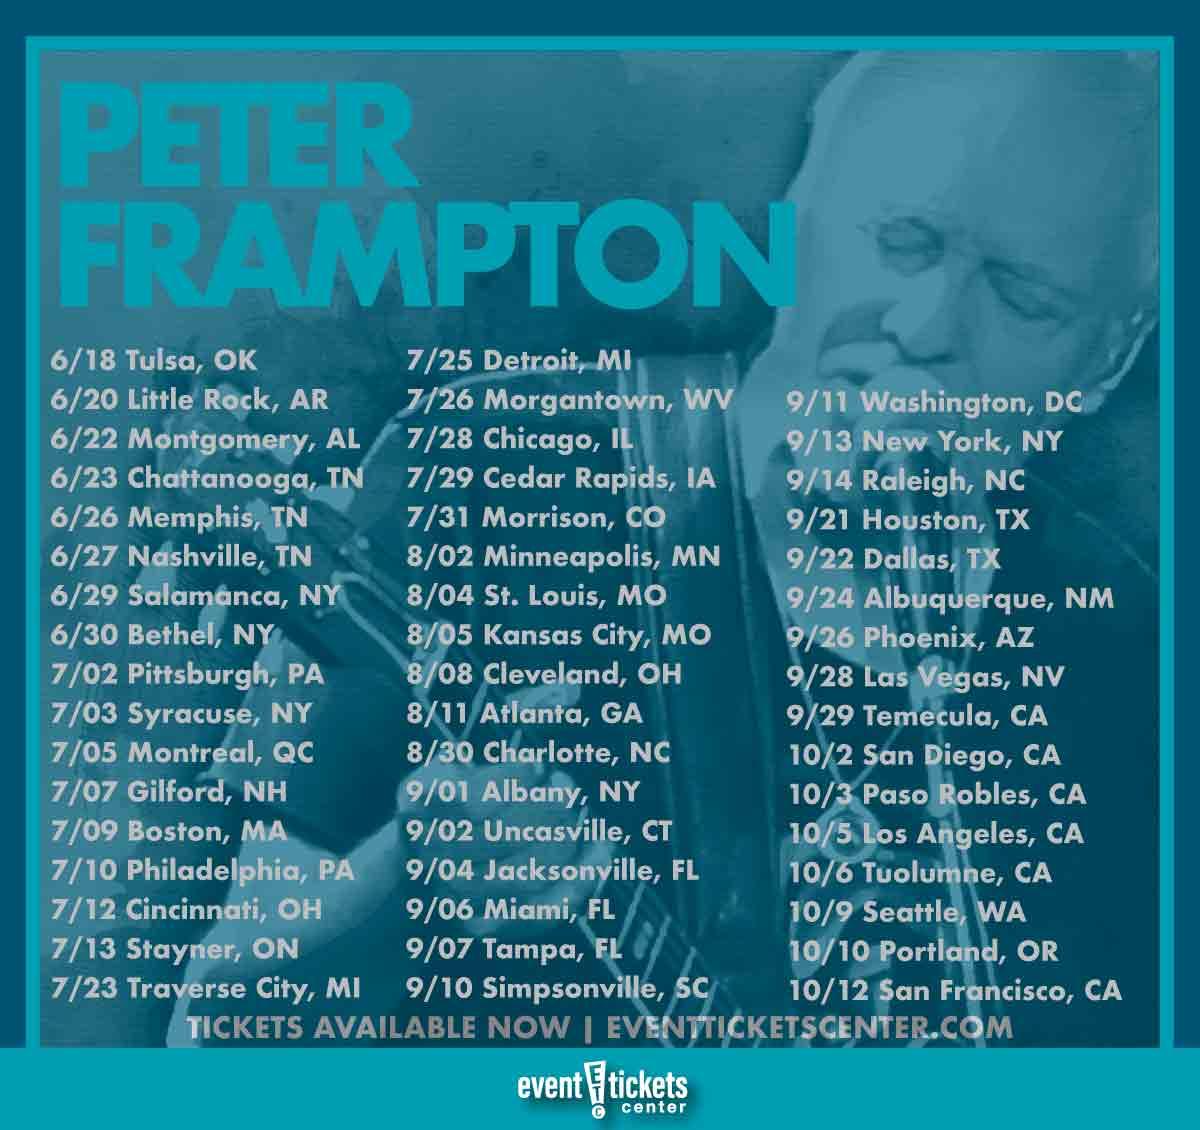 peter frampton tour dates